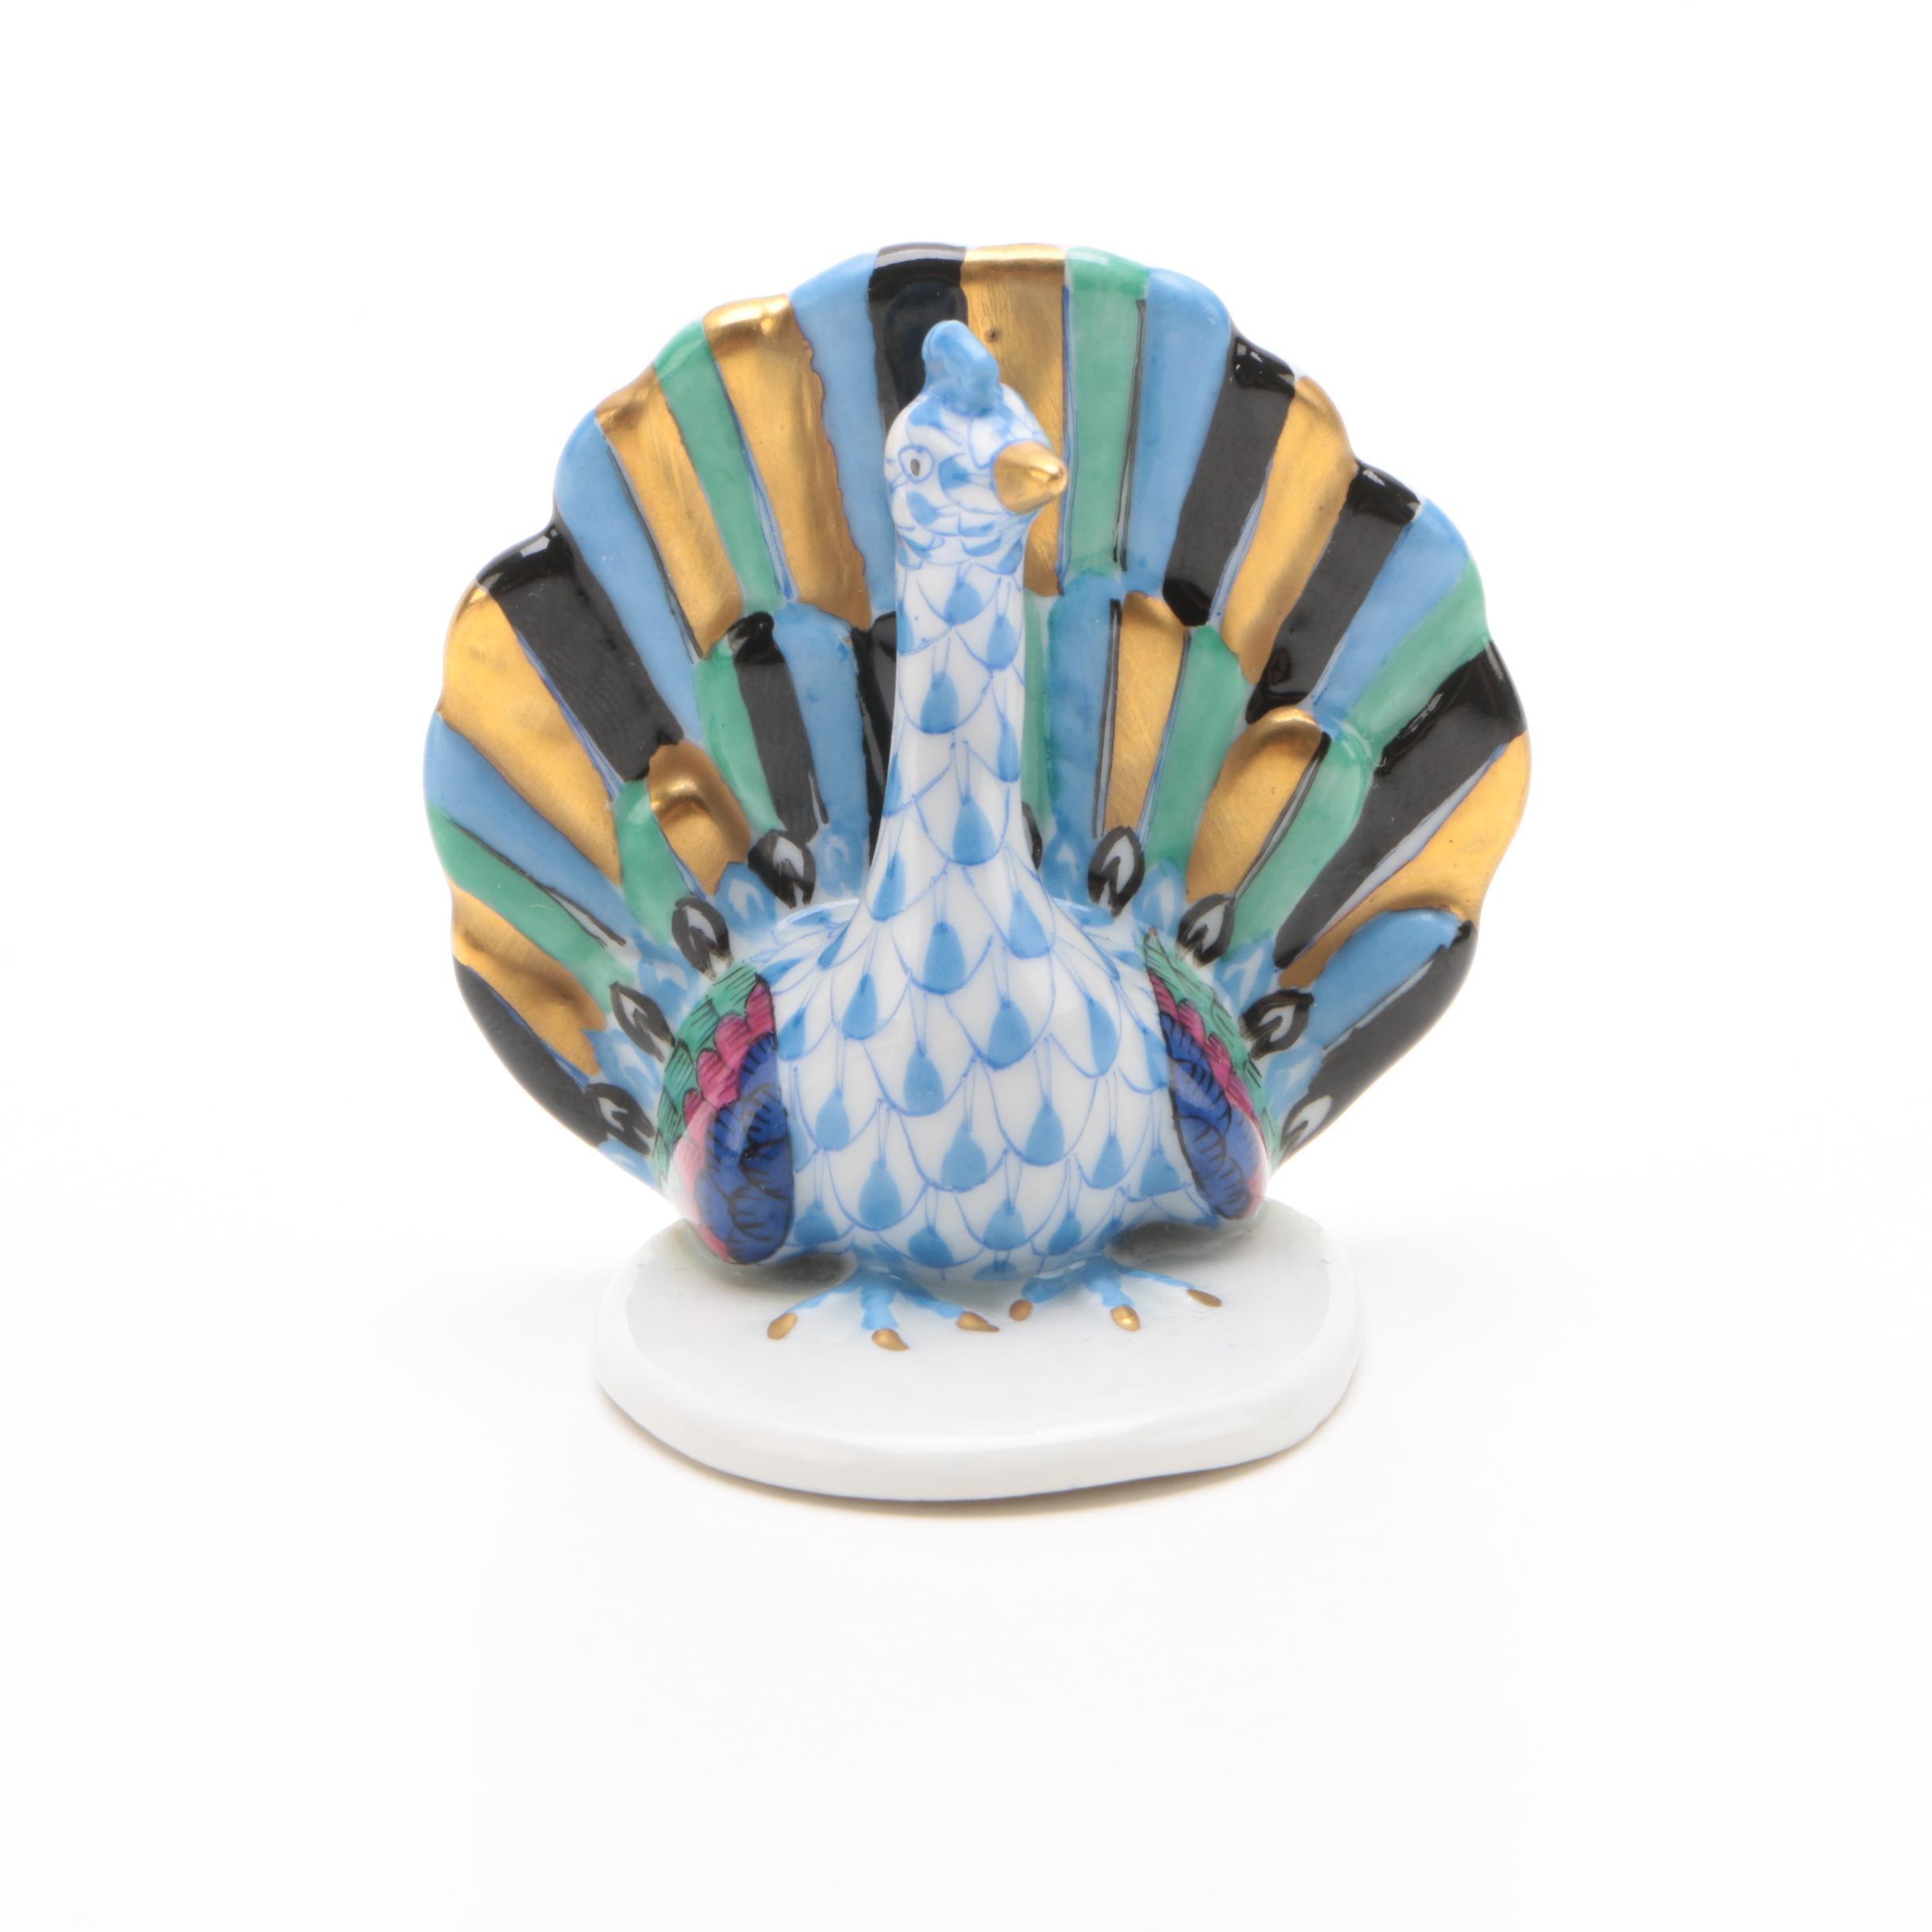 "Herend Hungary ""Peacock"" Porcelain Figurine"